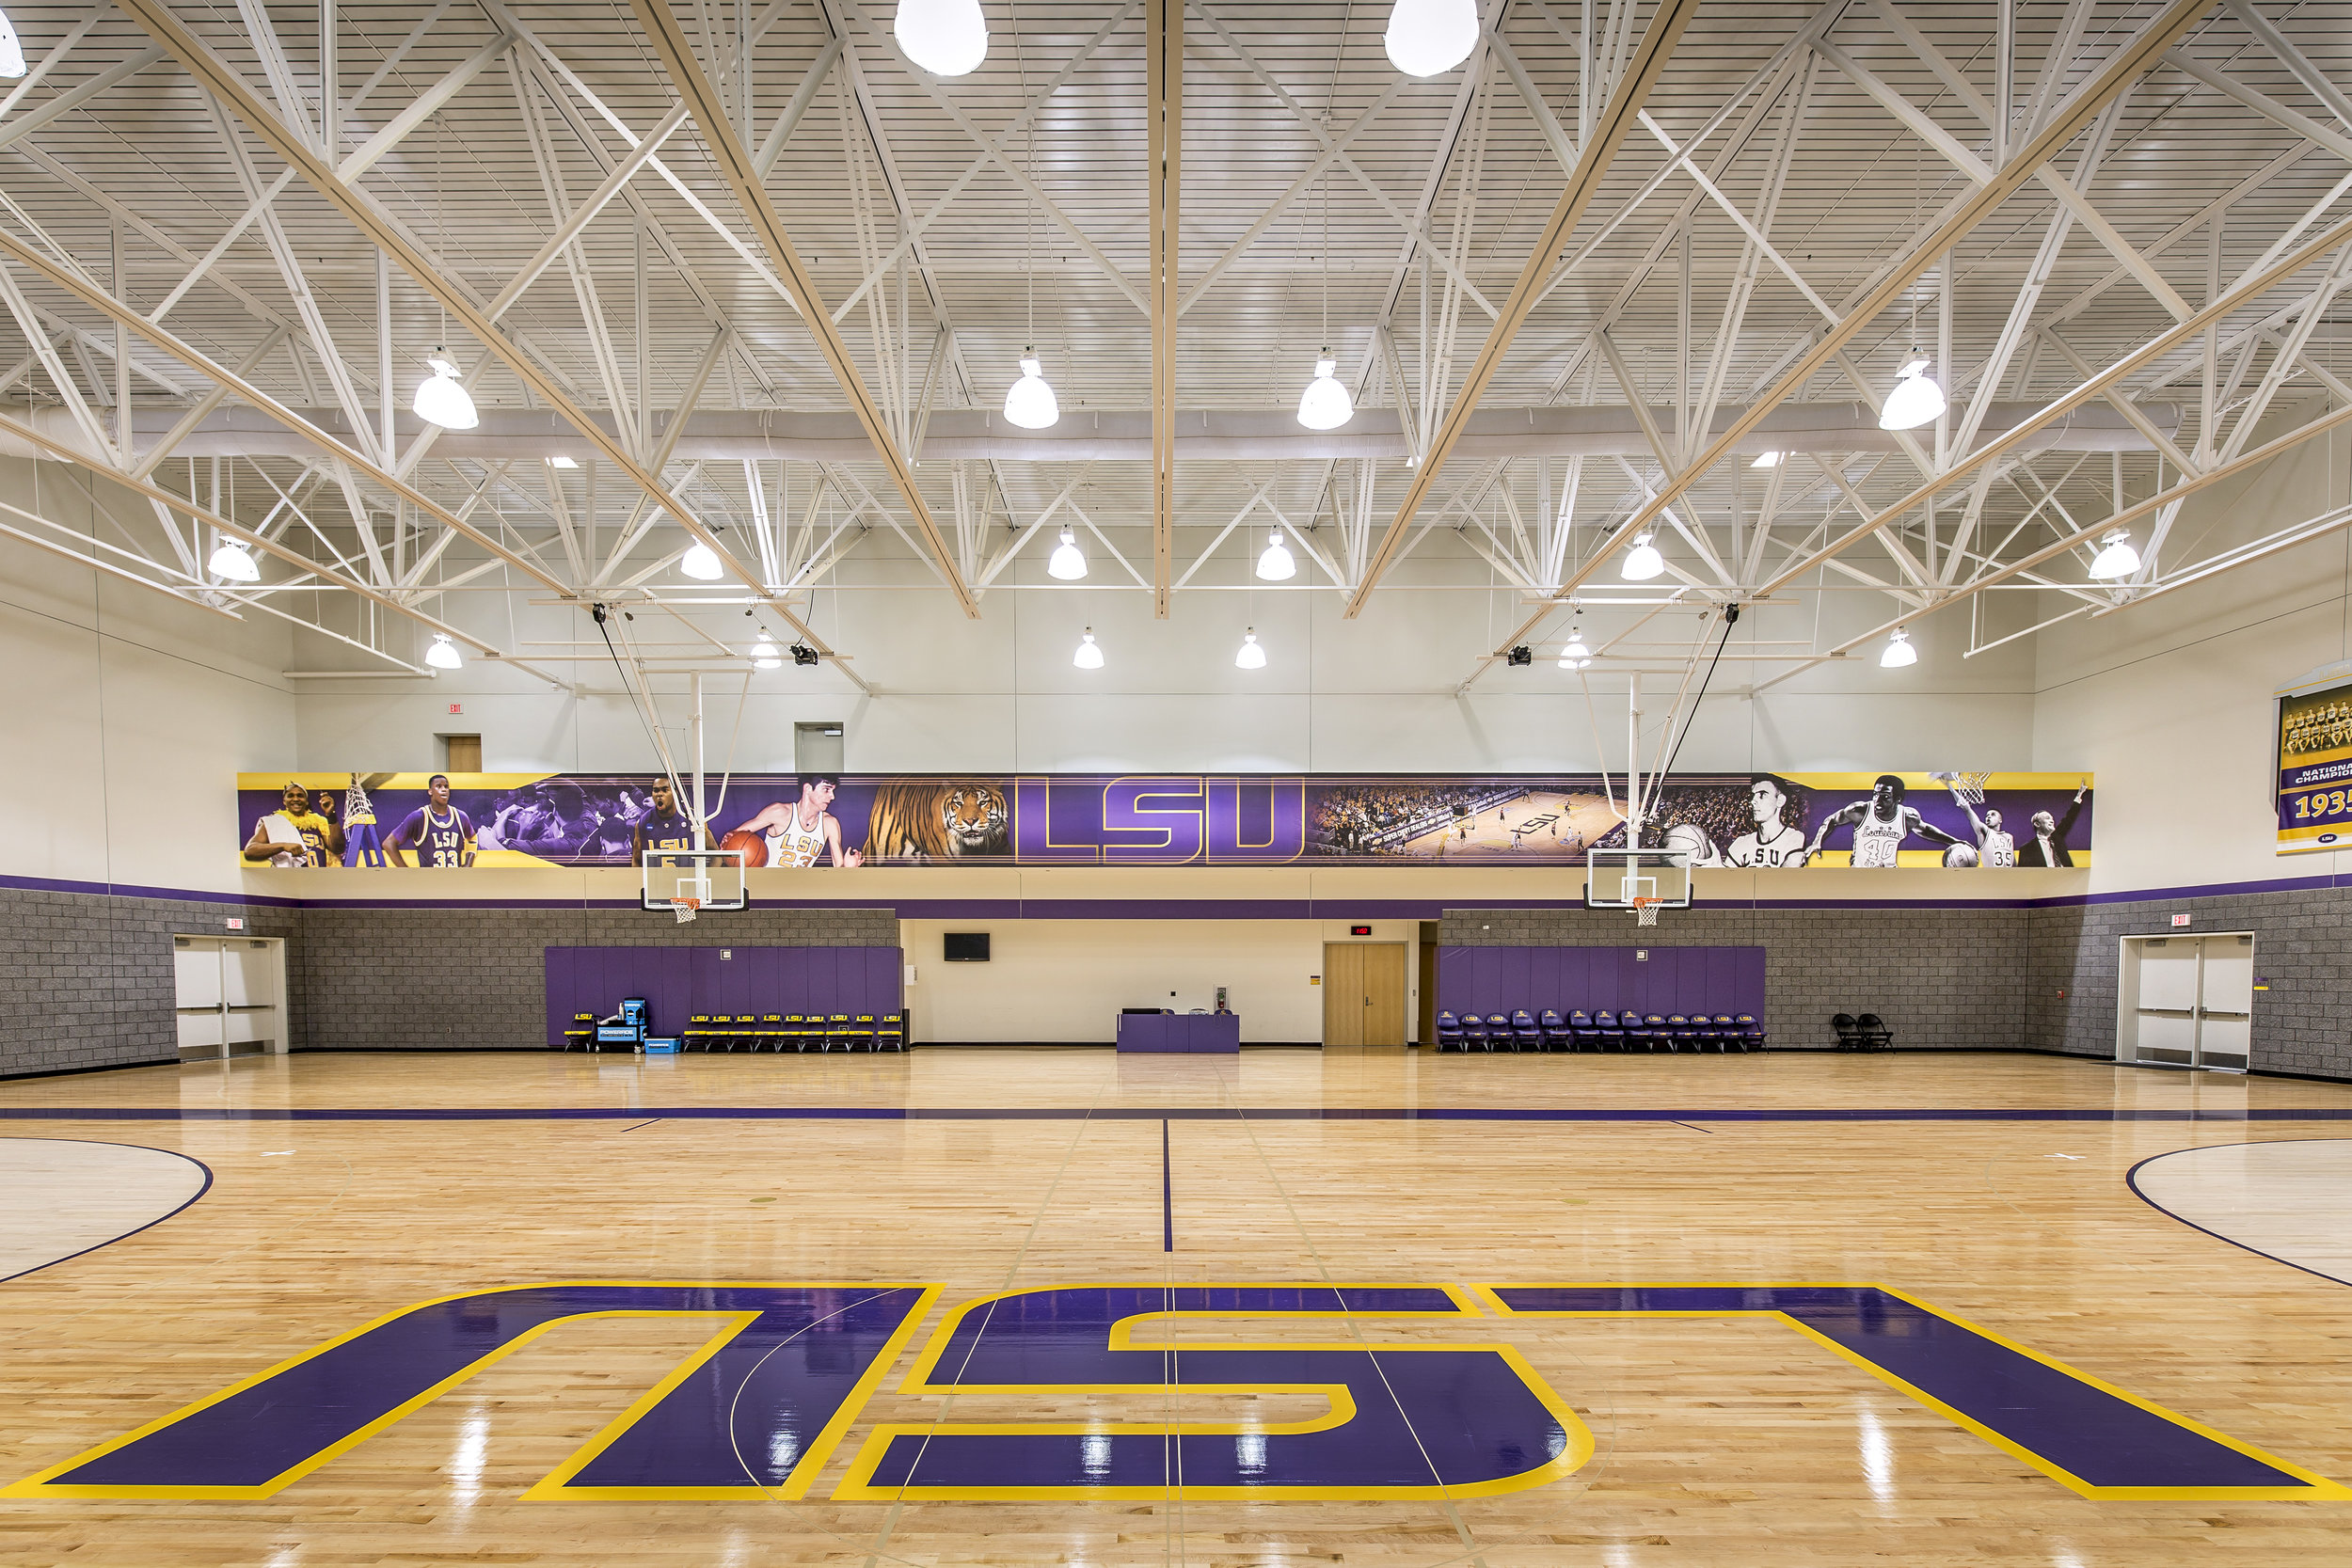 eP9673 49 Degrees - LSU Basketball Training Facility .jpg